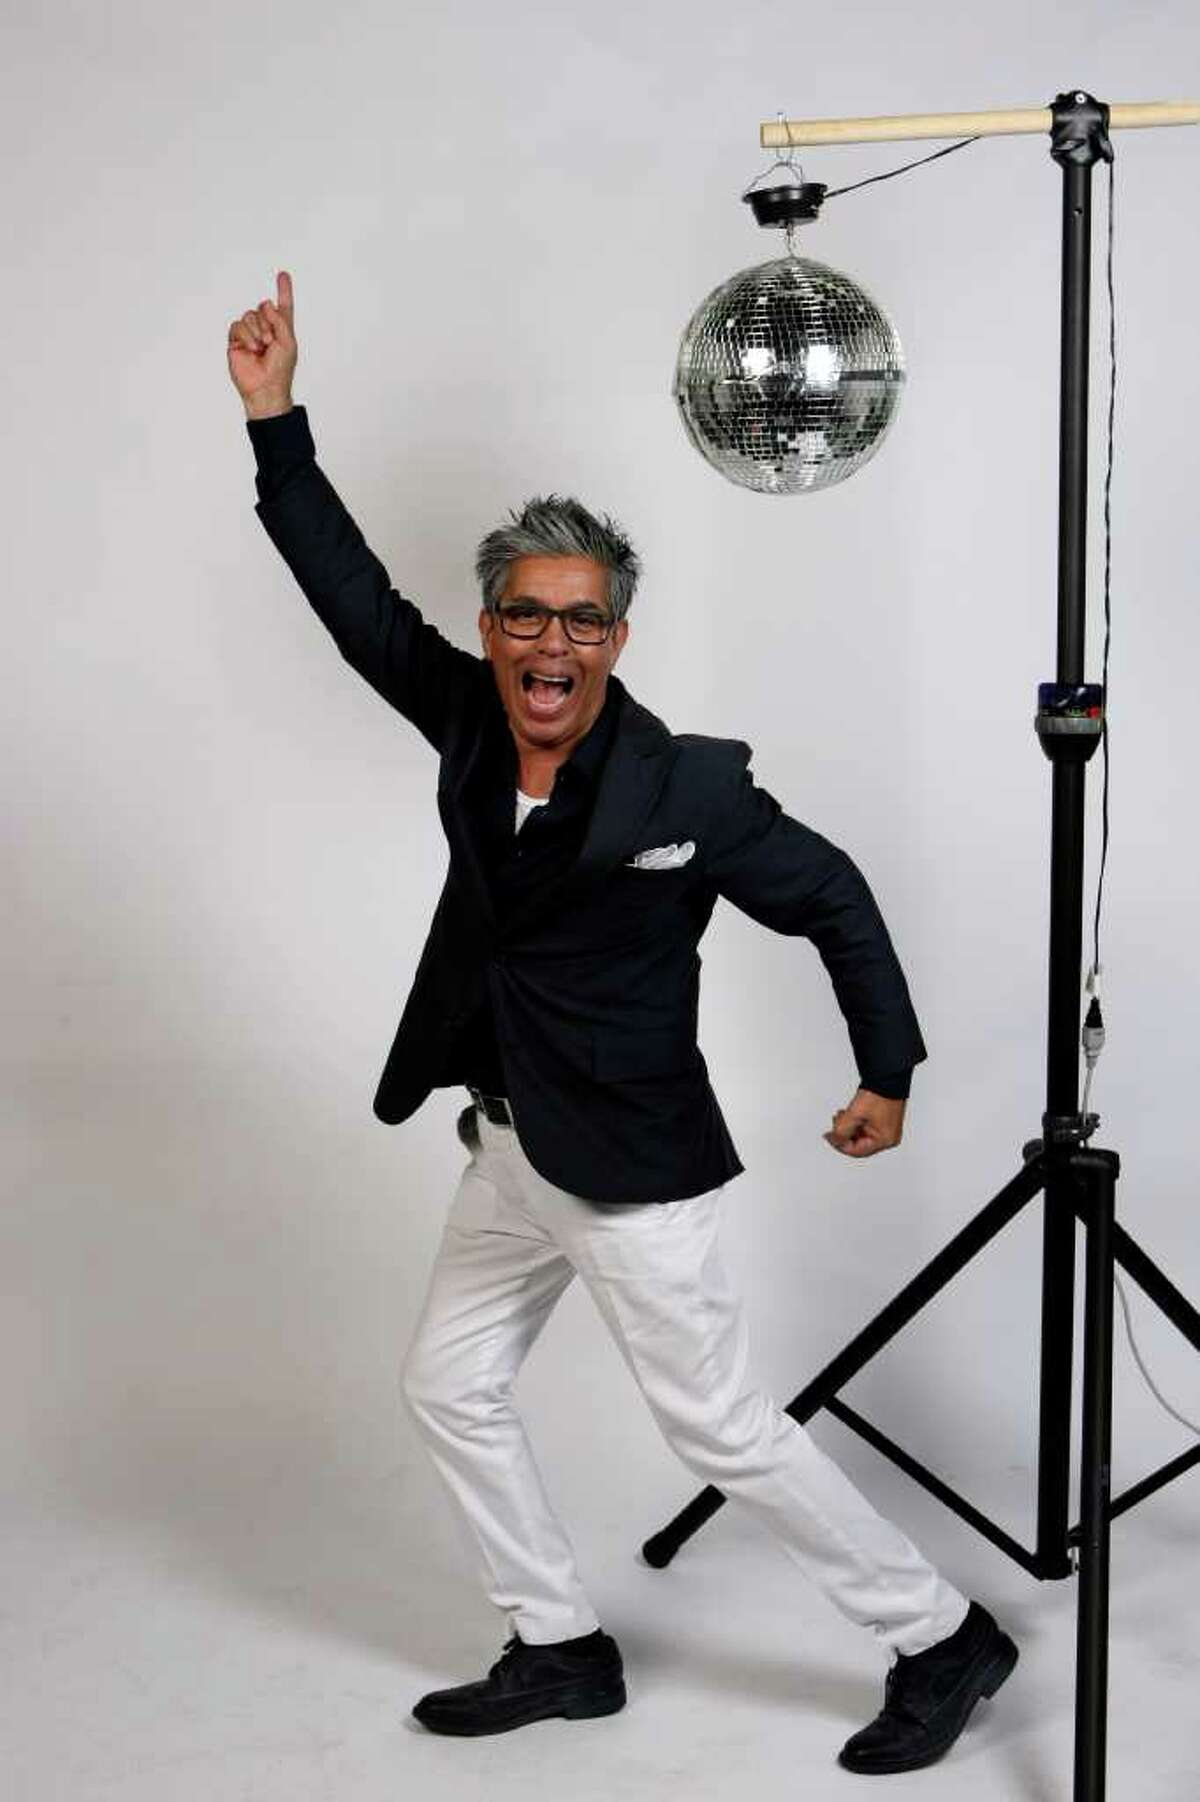 The Express-News' Michael Quintanilla wants Santa Claus to bring him a new disco ball for Christmas.